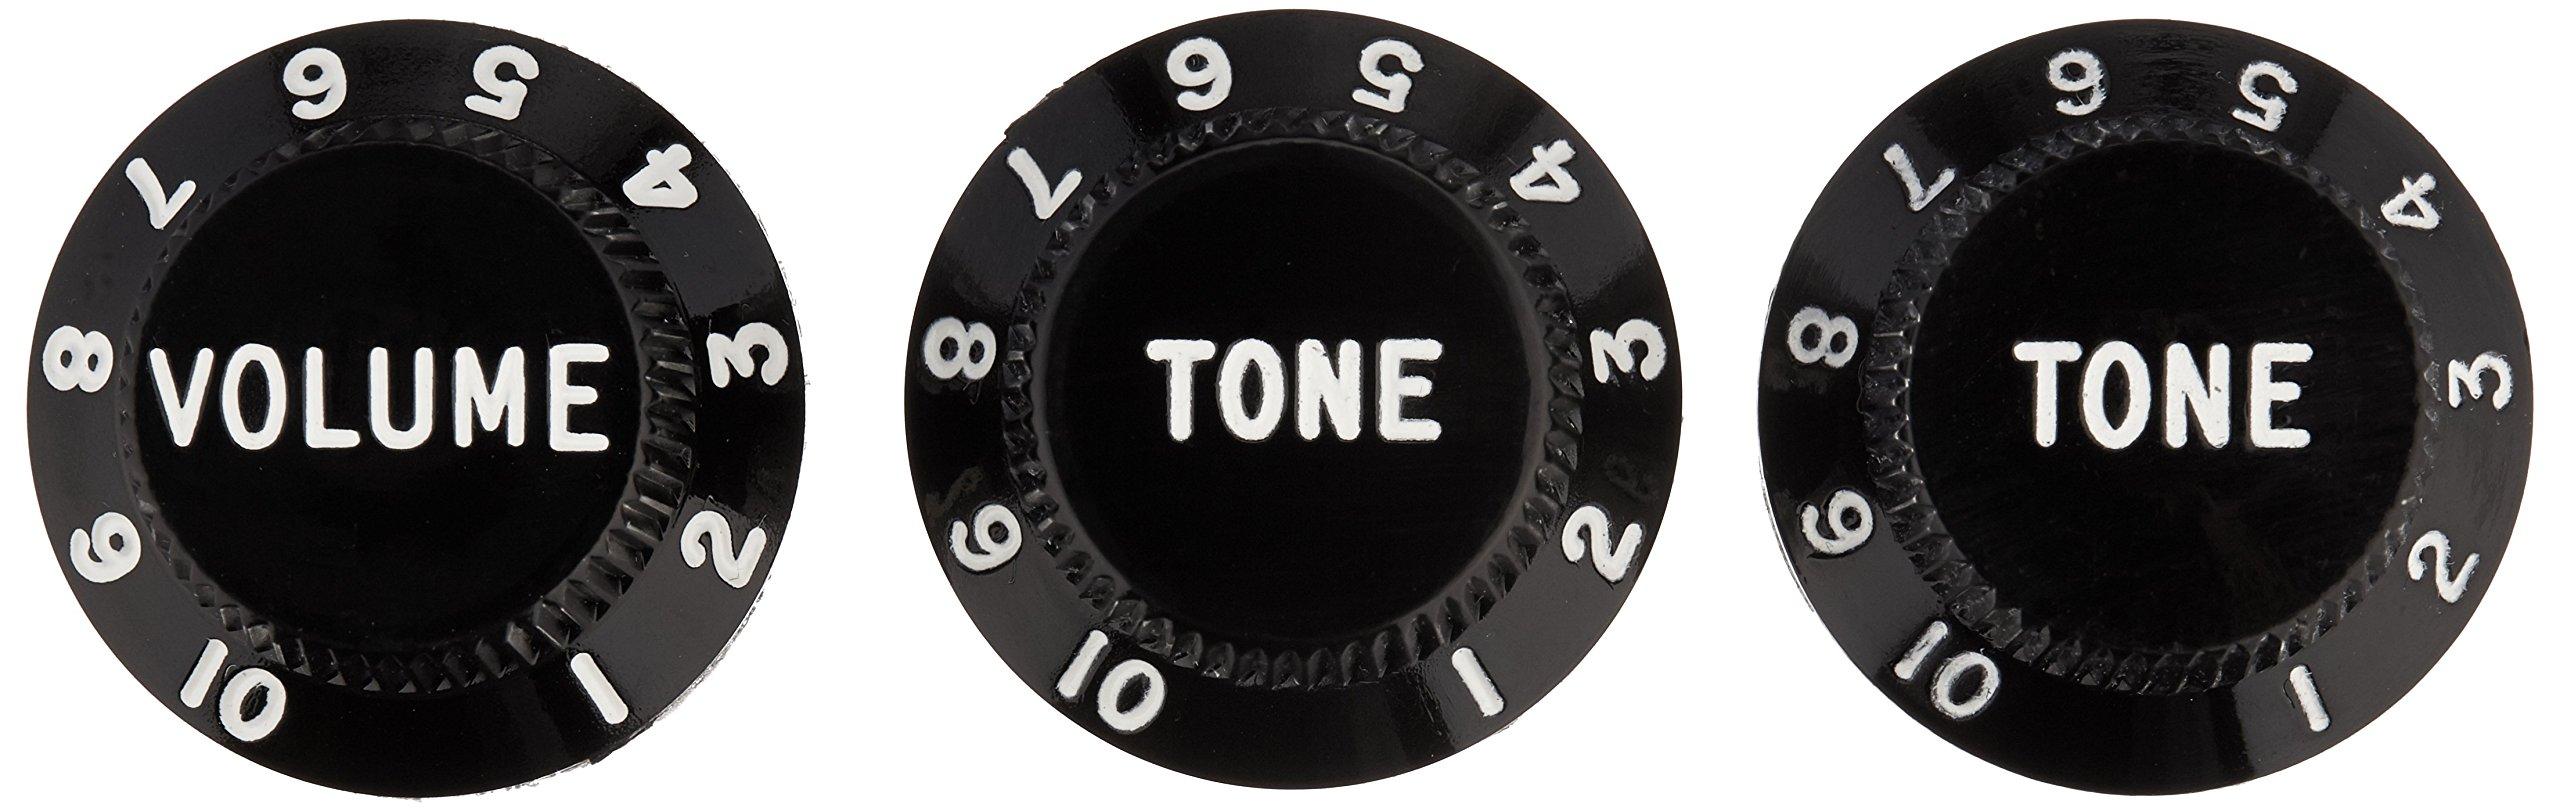 Fender Strat Knobs, One Volume, Two Tone,  Black